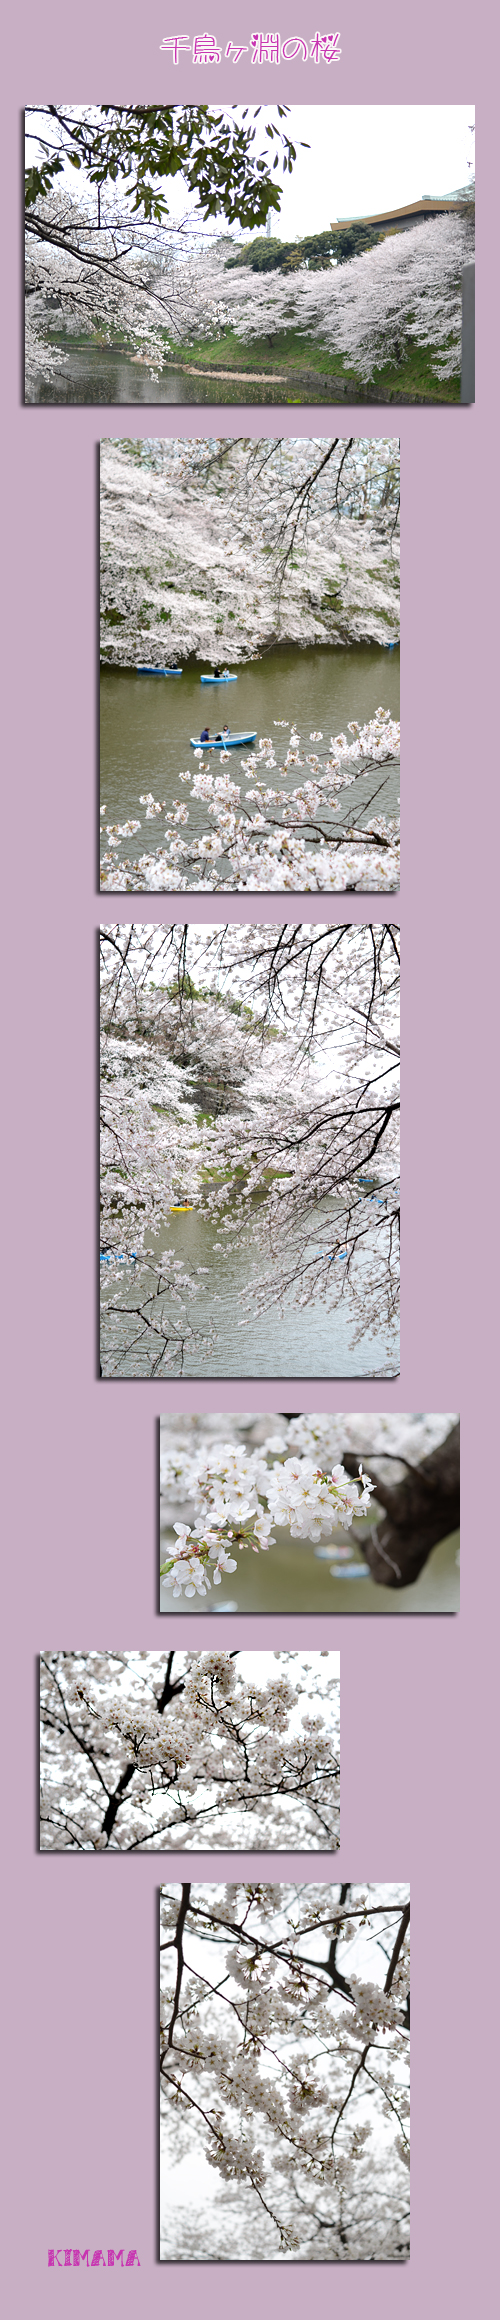 3月23日桜1